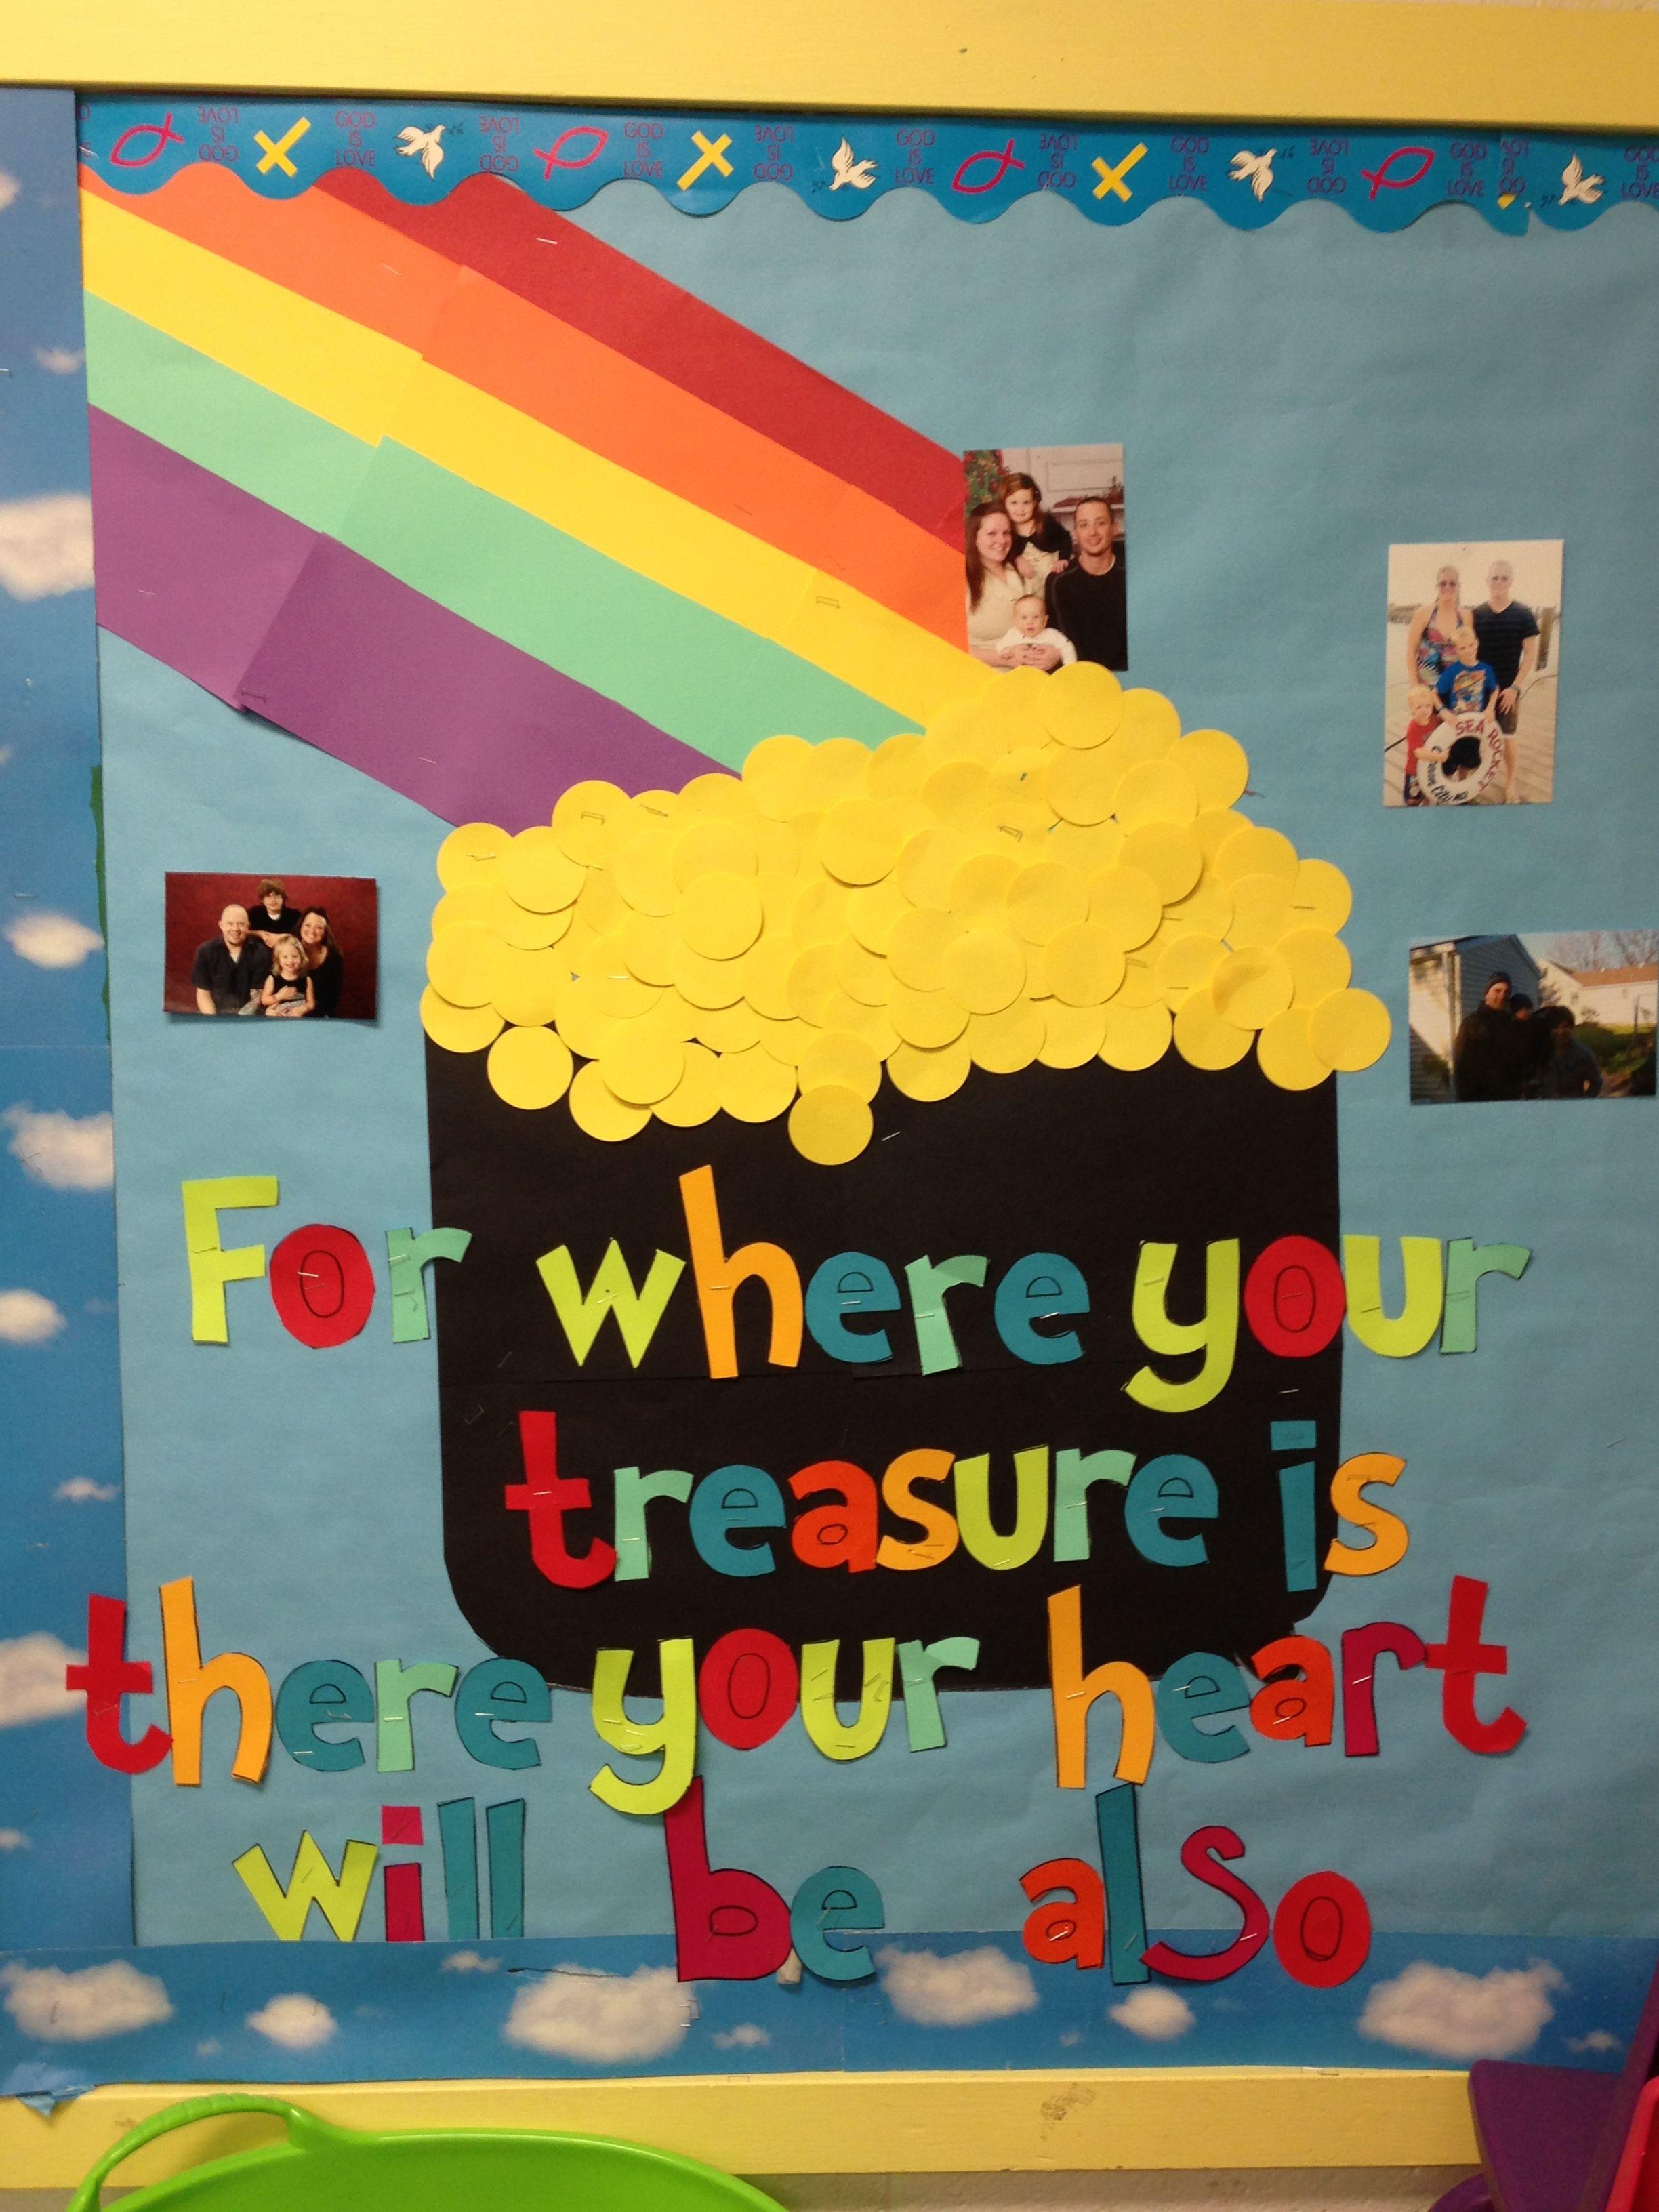 treasure your heart